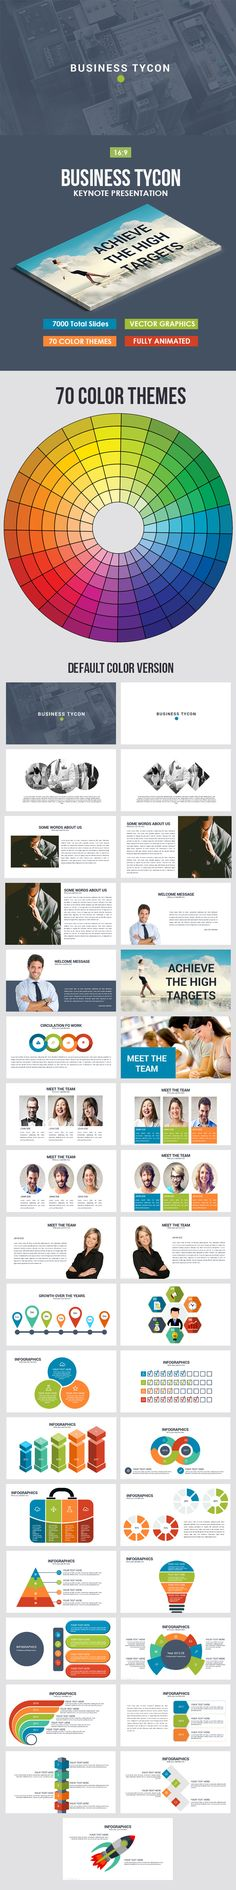 Business Tycon Keynote Template